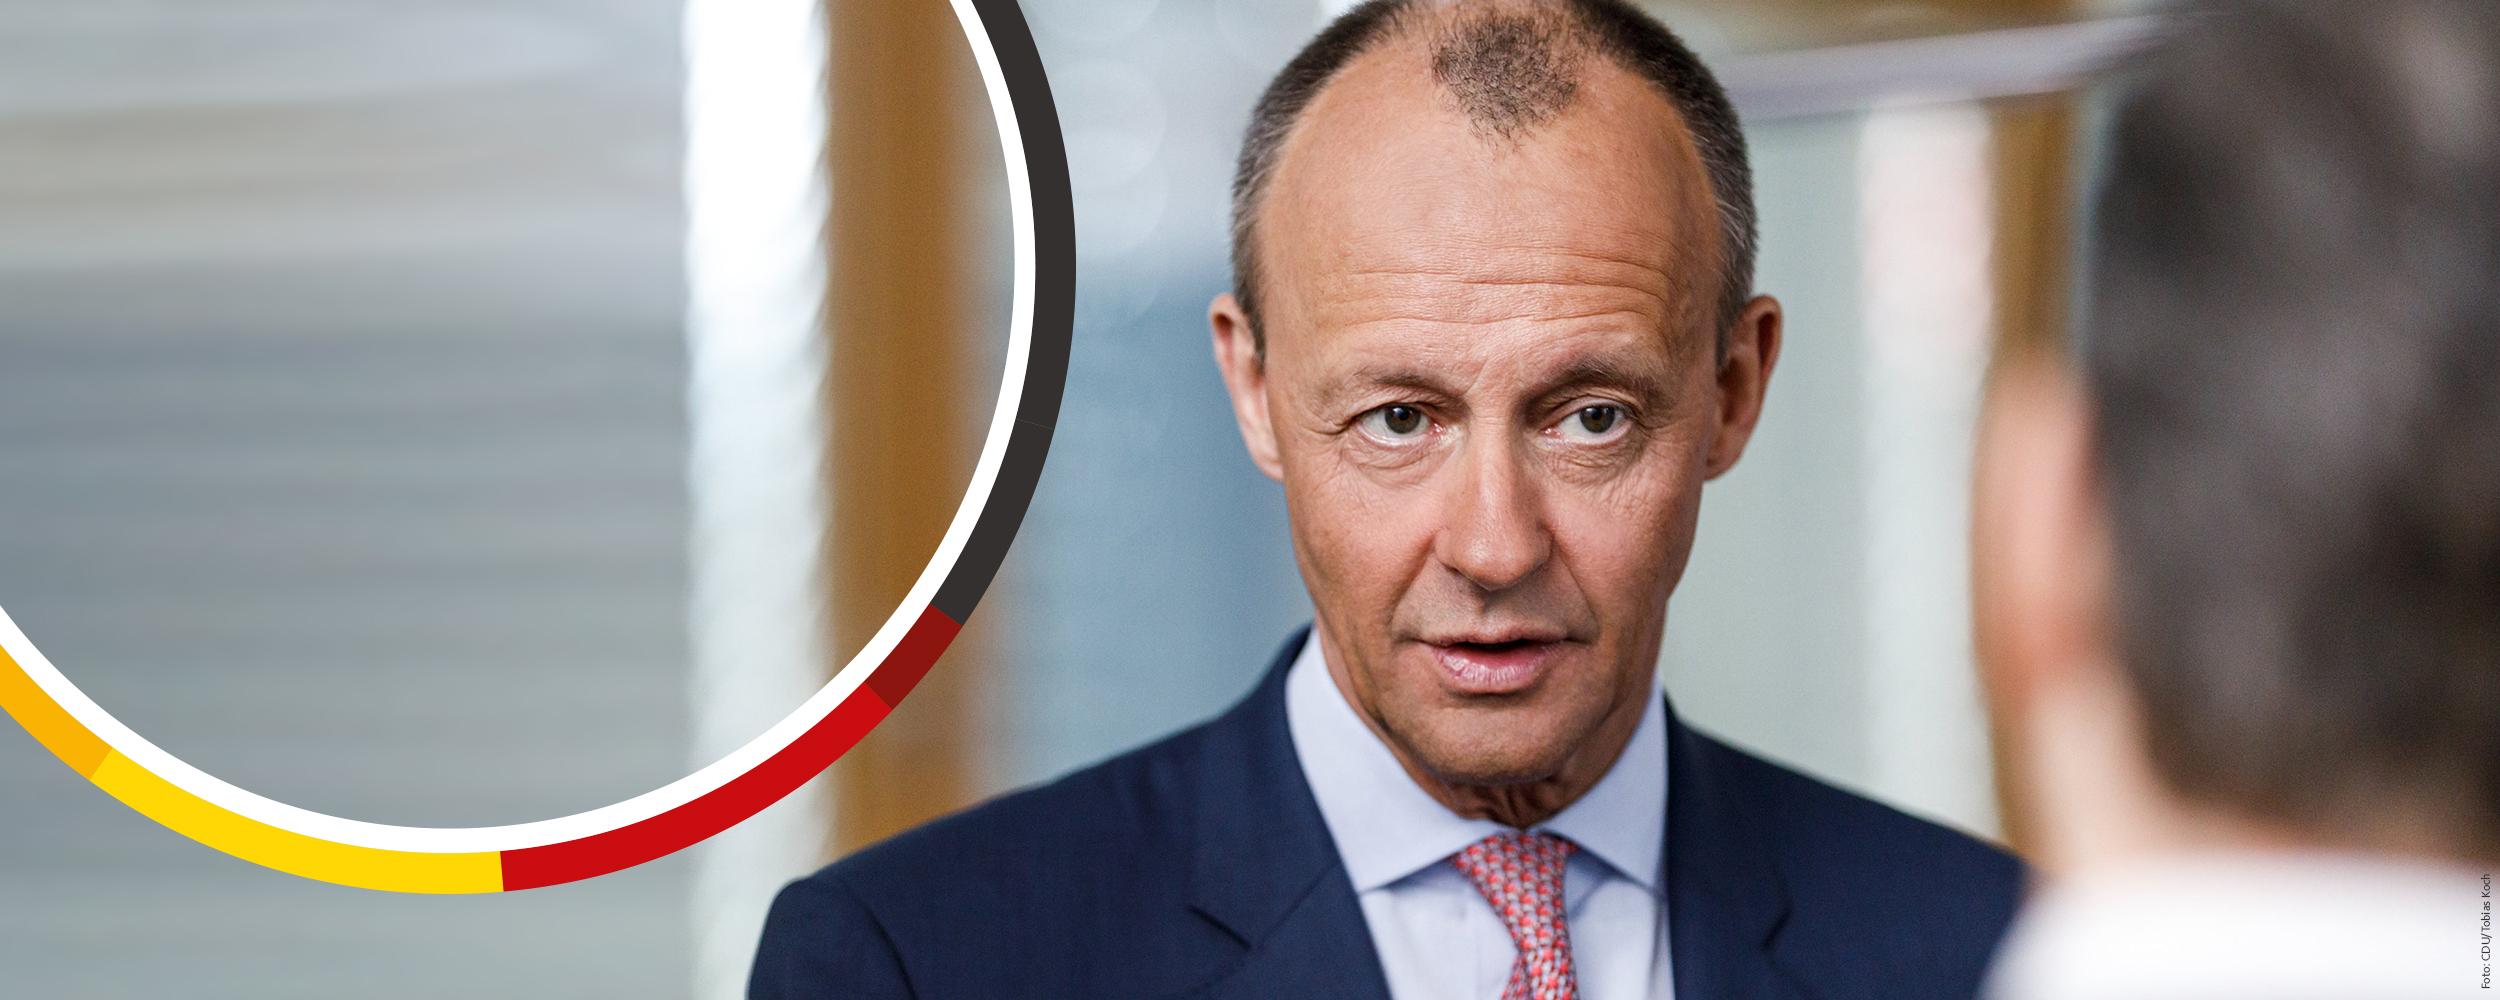 #CDUVorsitz:|Kandidat Friedrich Merz